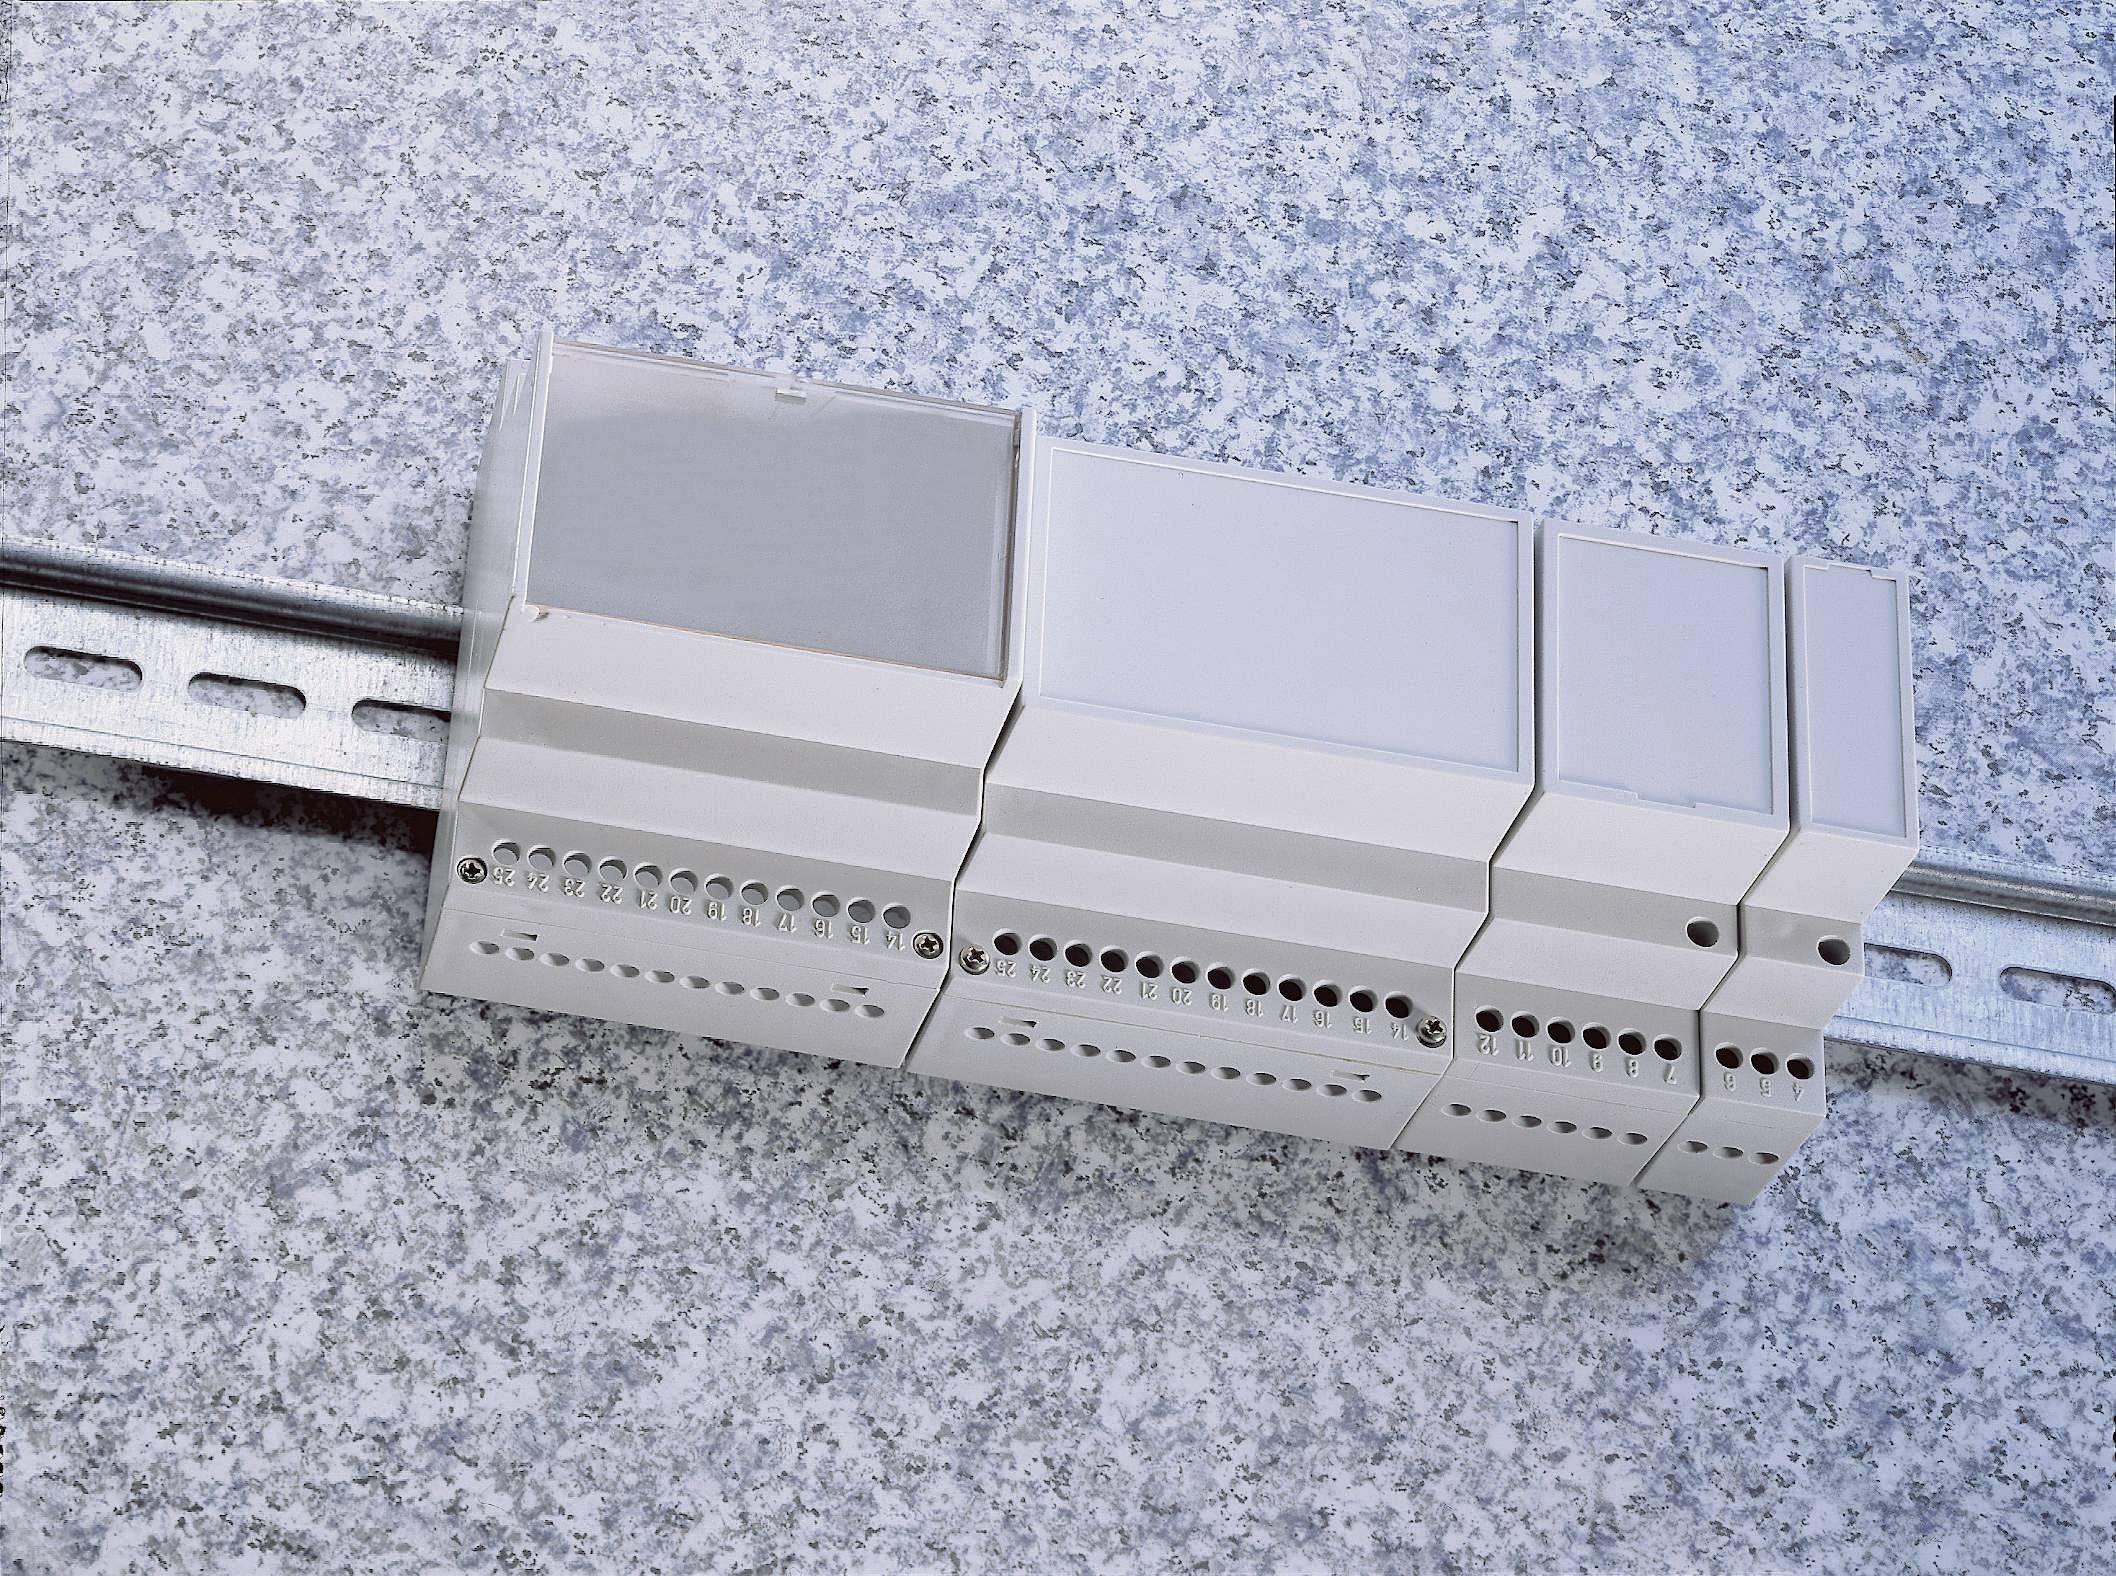 Pouzdro do lišty Weltron MR4/C FA RAL7035 ABS (018037129128), 70 x 90 x 68 mm